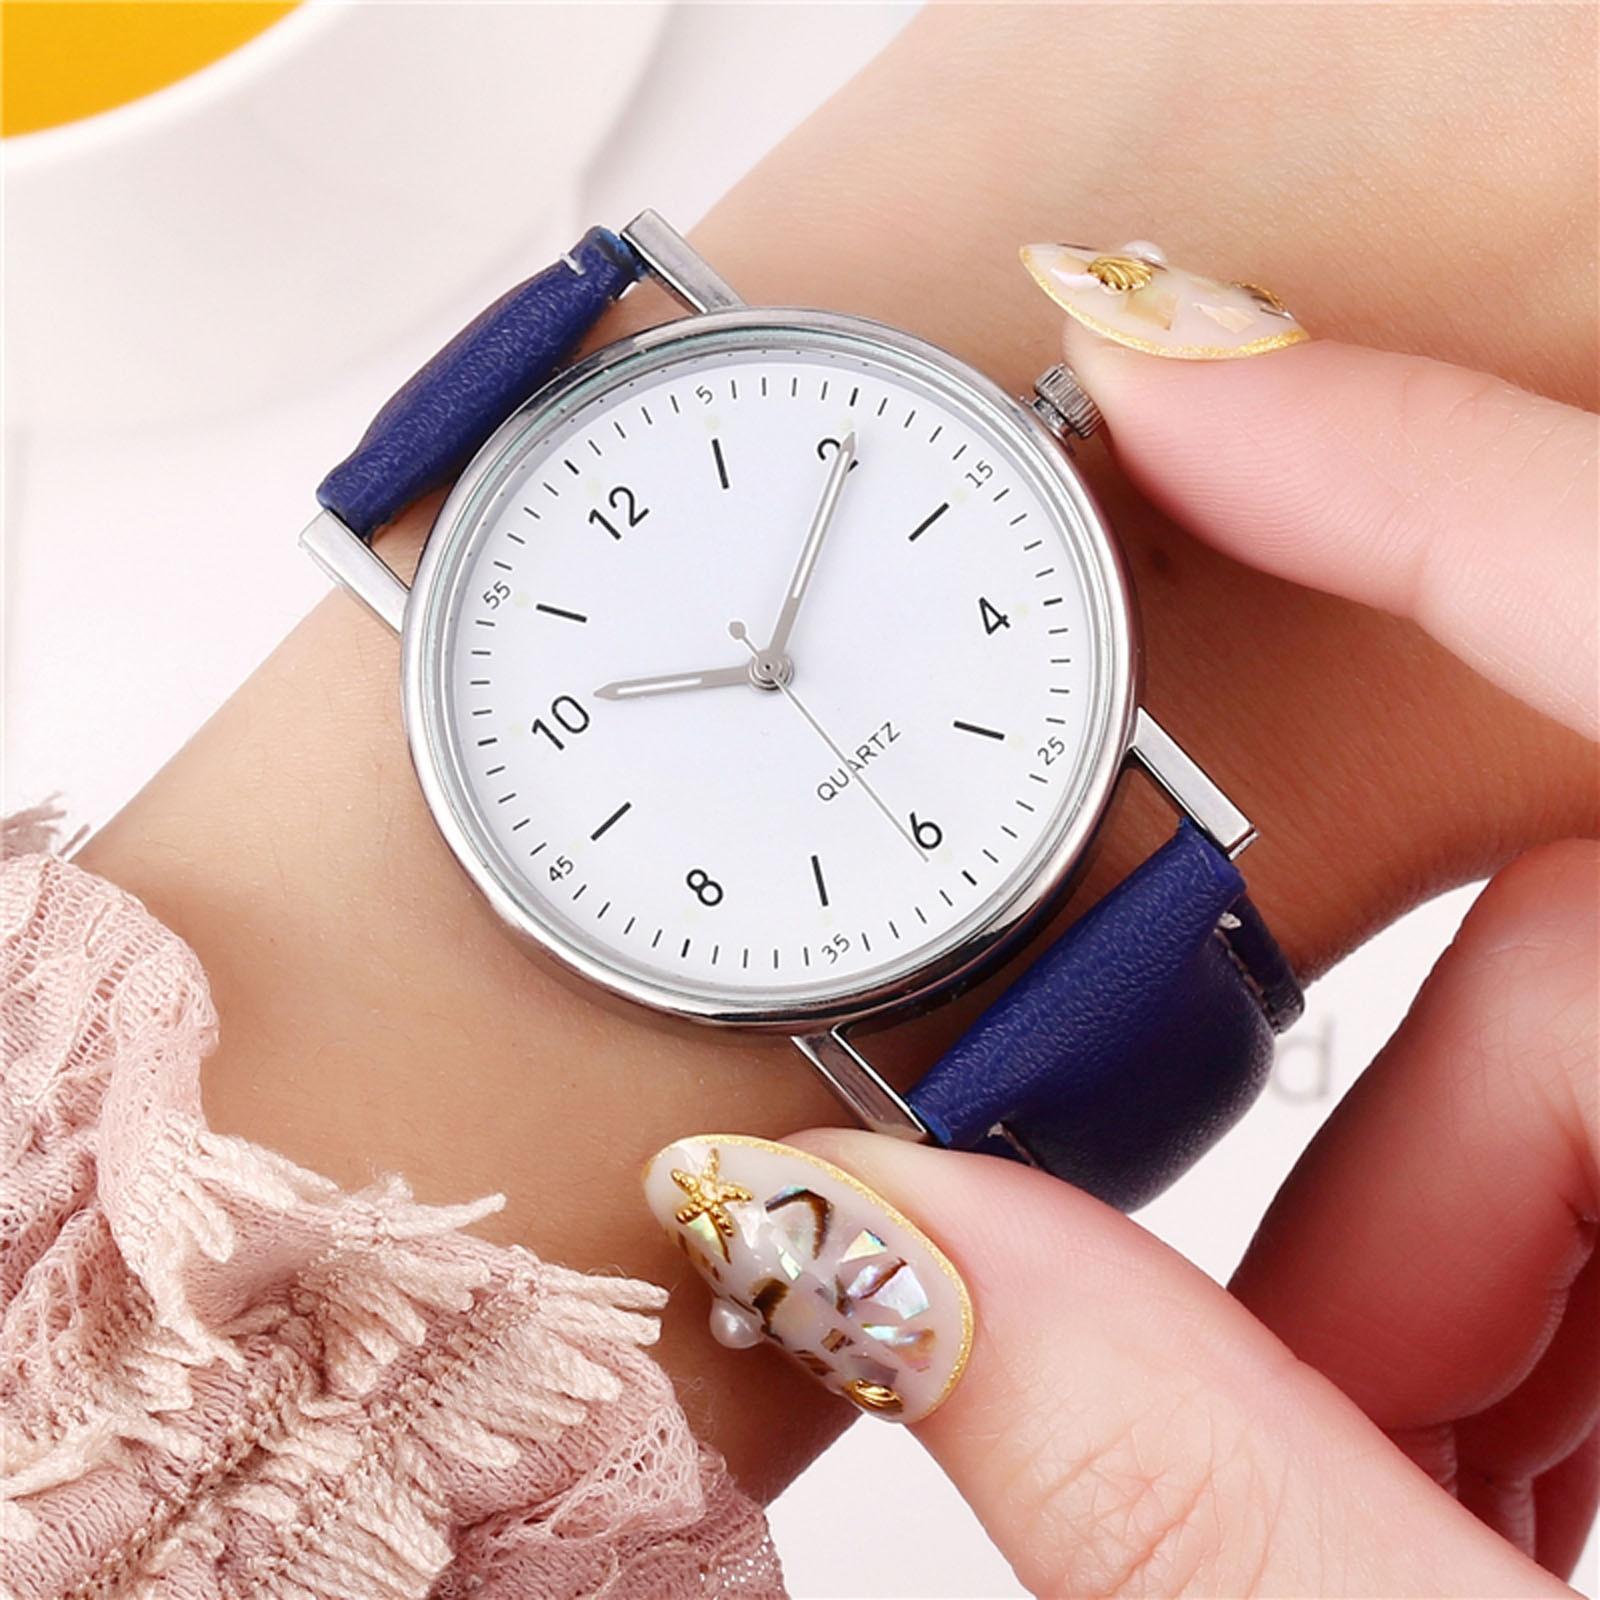 Top Brand ladies watch free shipping High-End Luminous Watch Ladies Quartz Leather strap Watches женские часы недорого F5